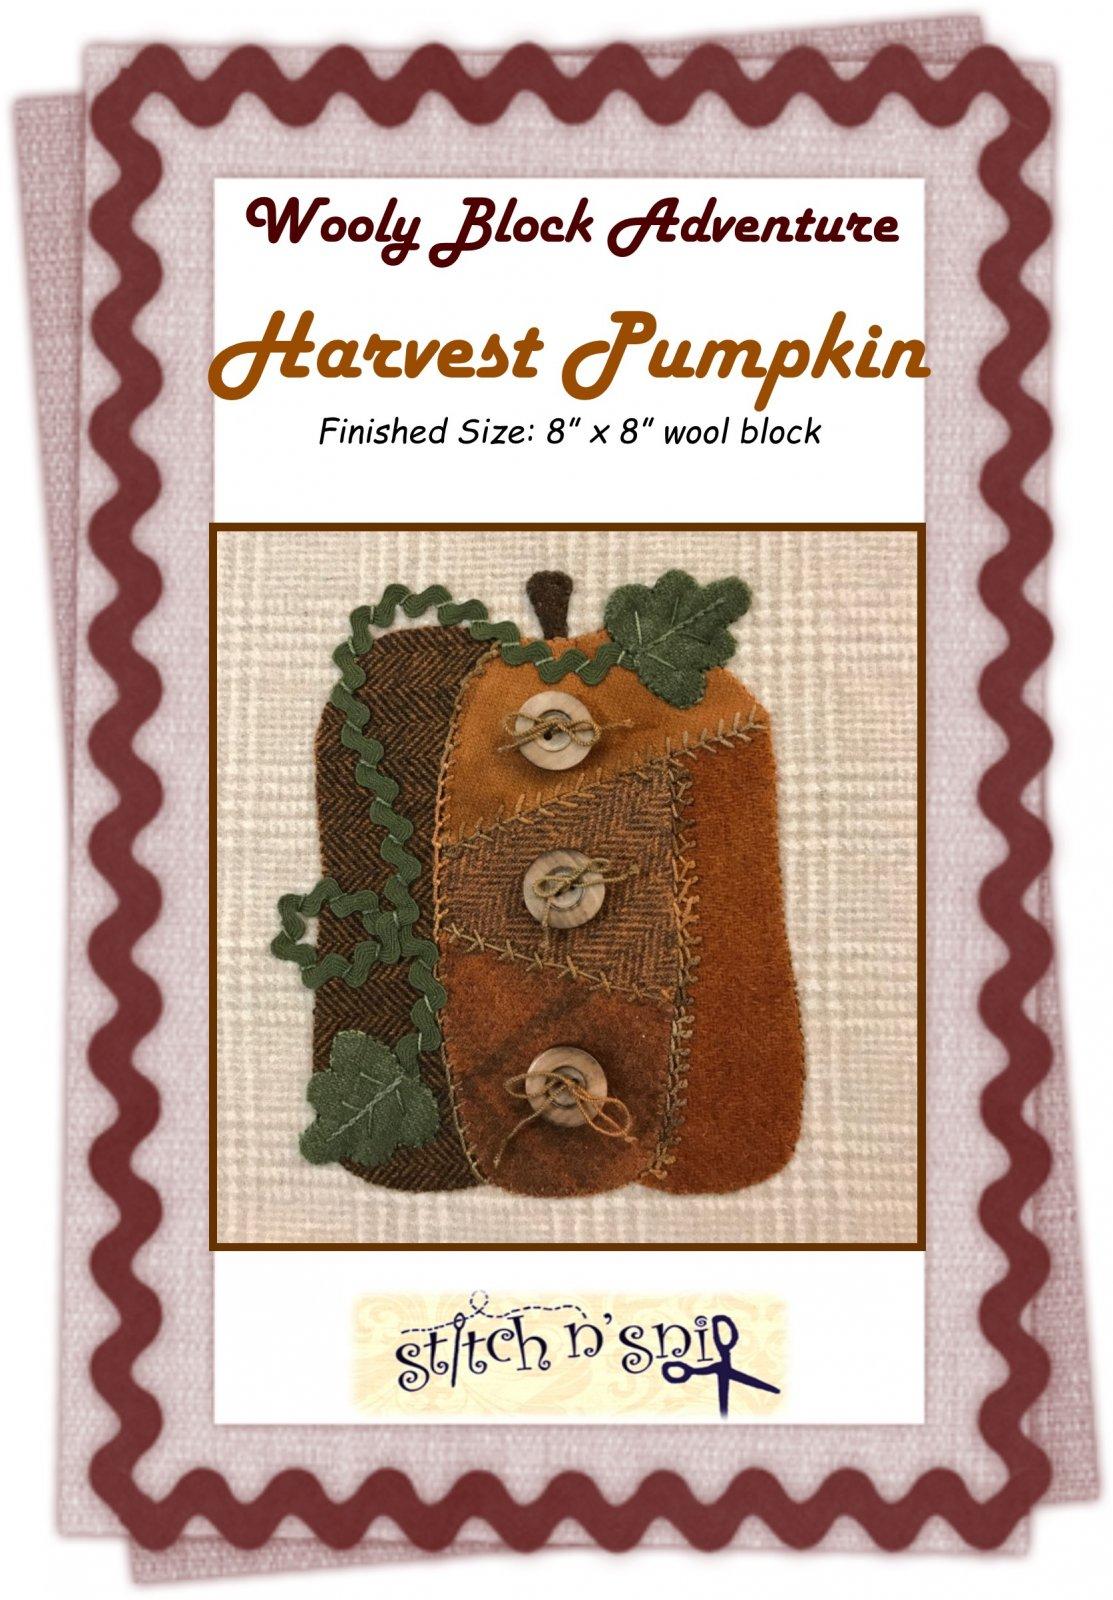 Wooly Block 2017: Harvest Pumpkin Pattern